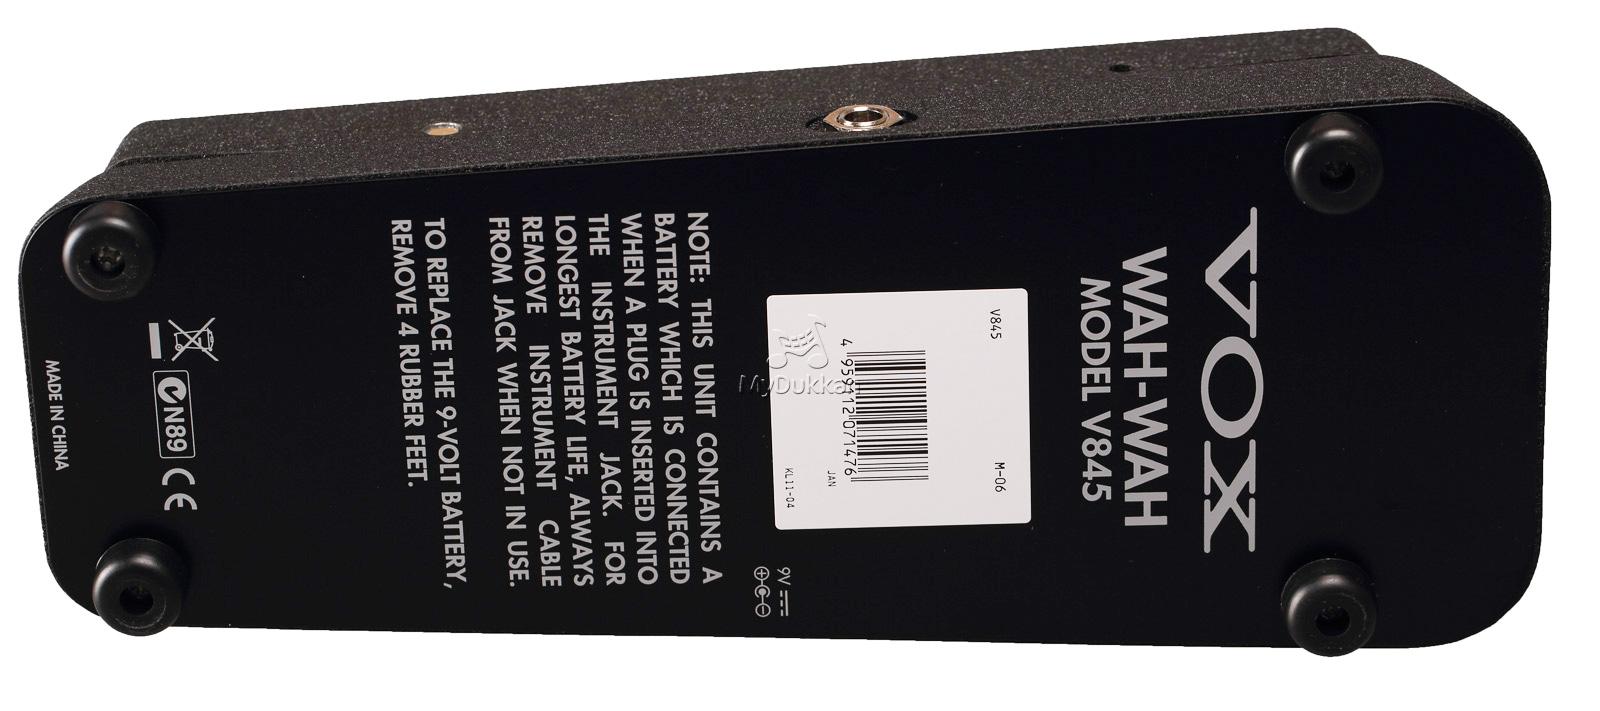 Vox V845 Vs V847 Electrosmash Wah Classic Pedal Mydukkan 1600x711